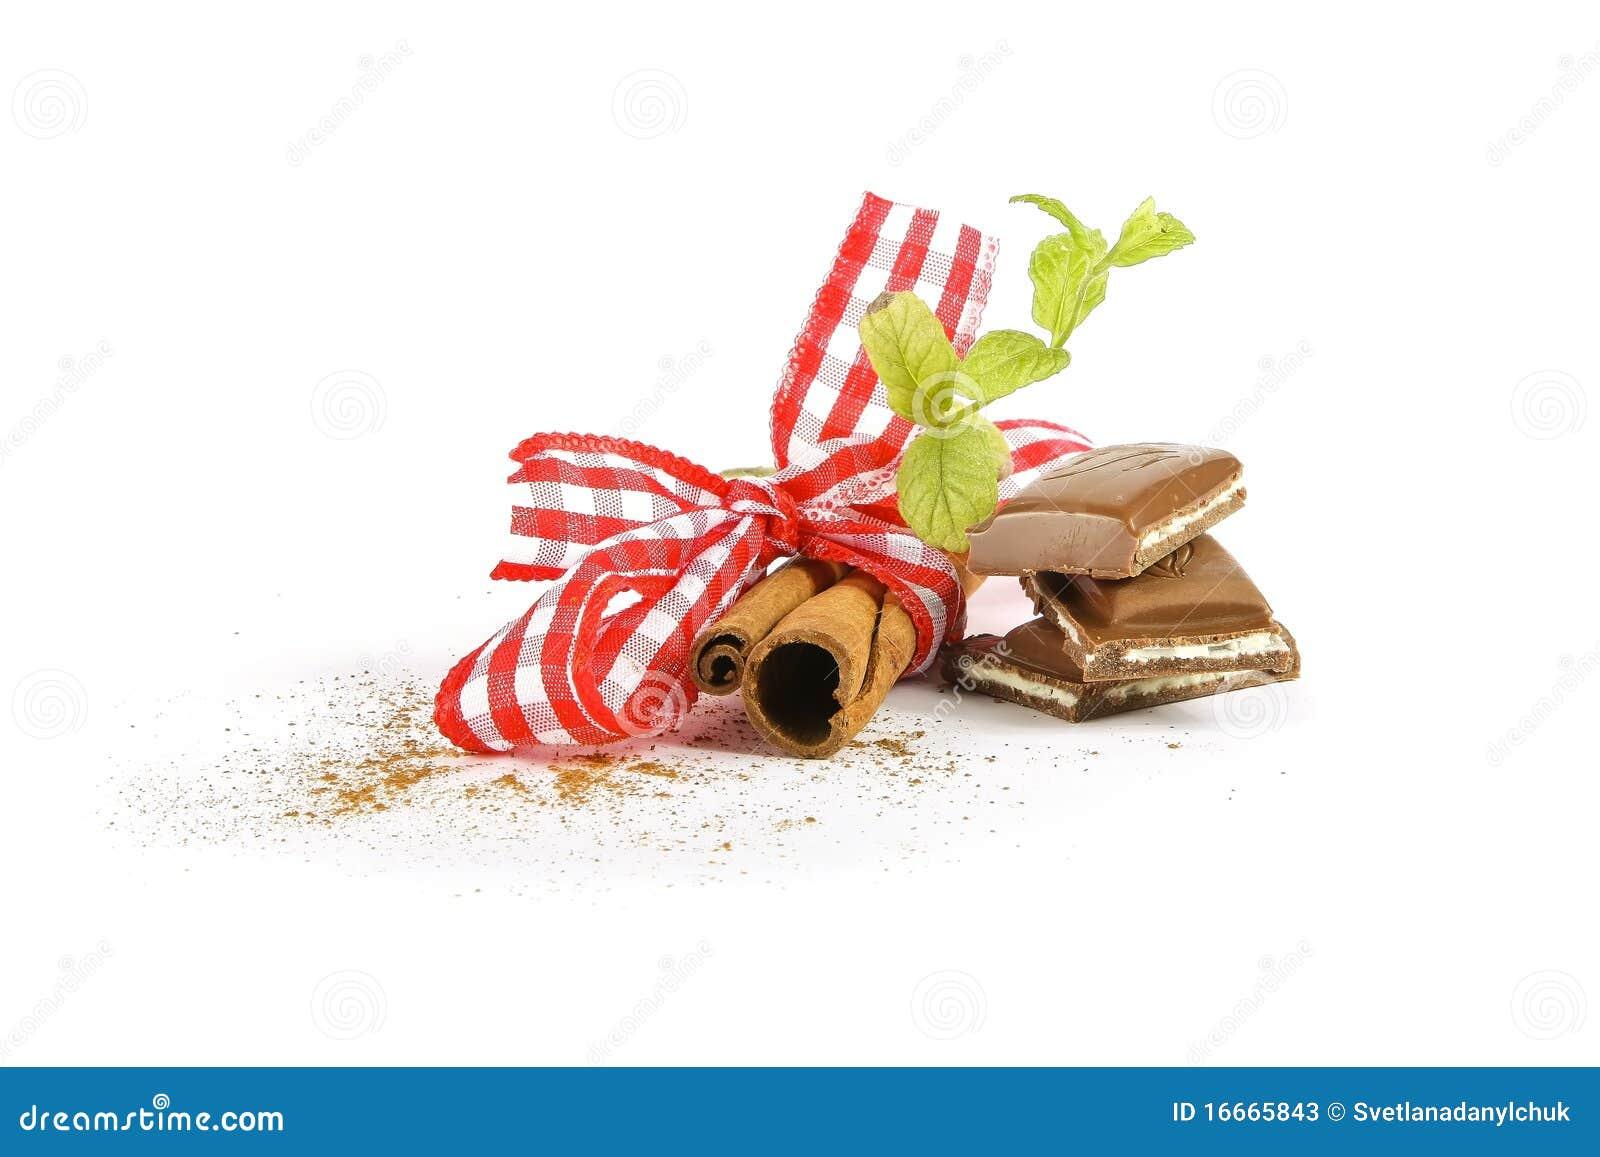 Cinnamon sticks and mint